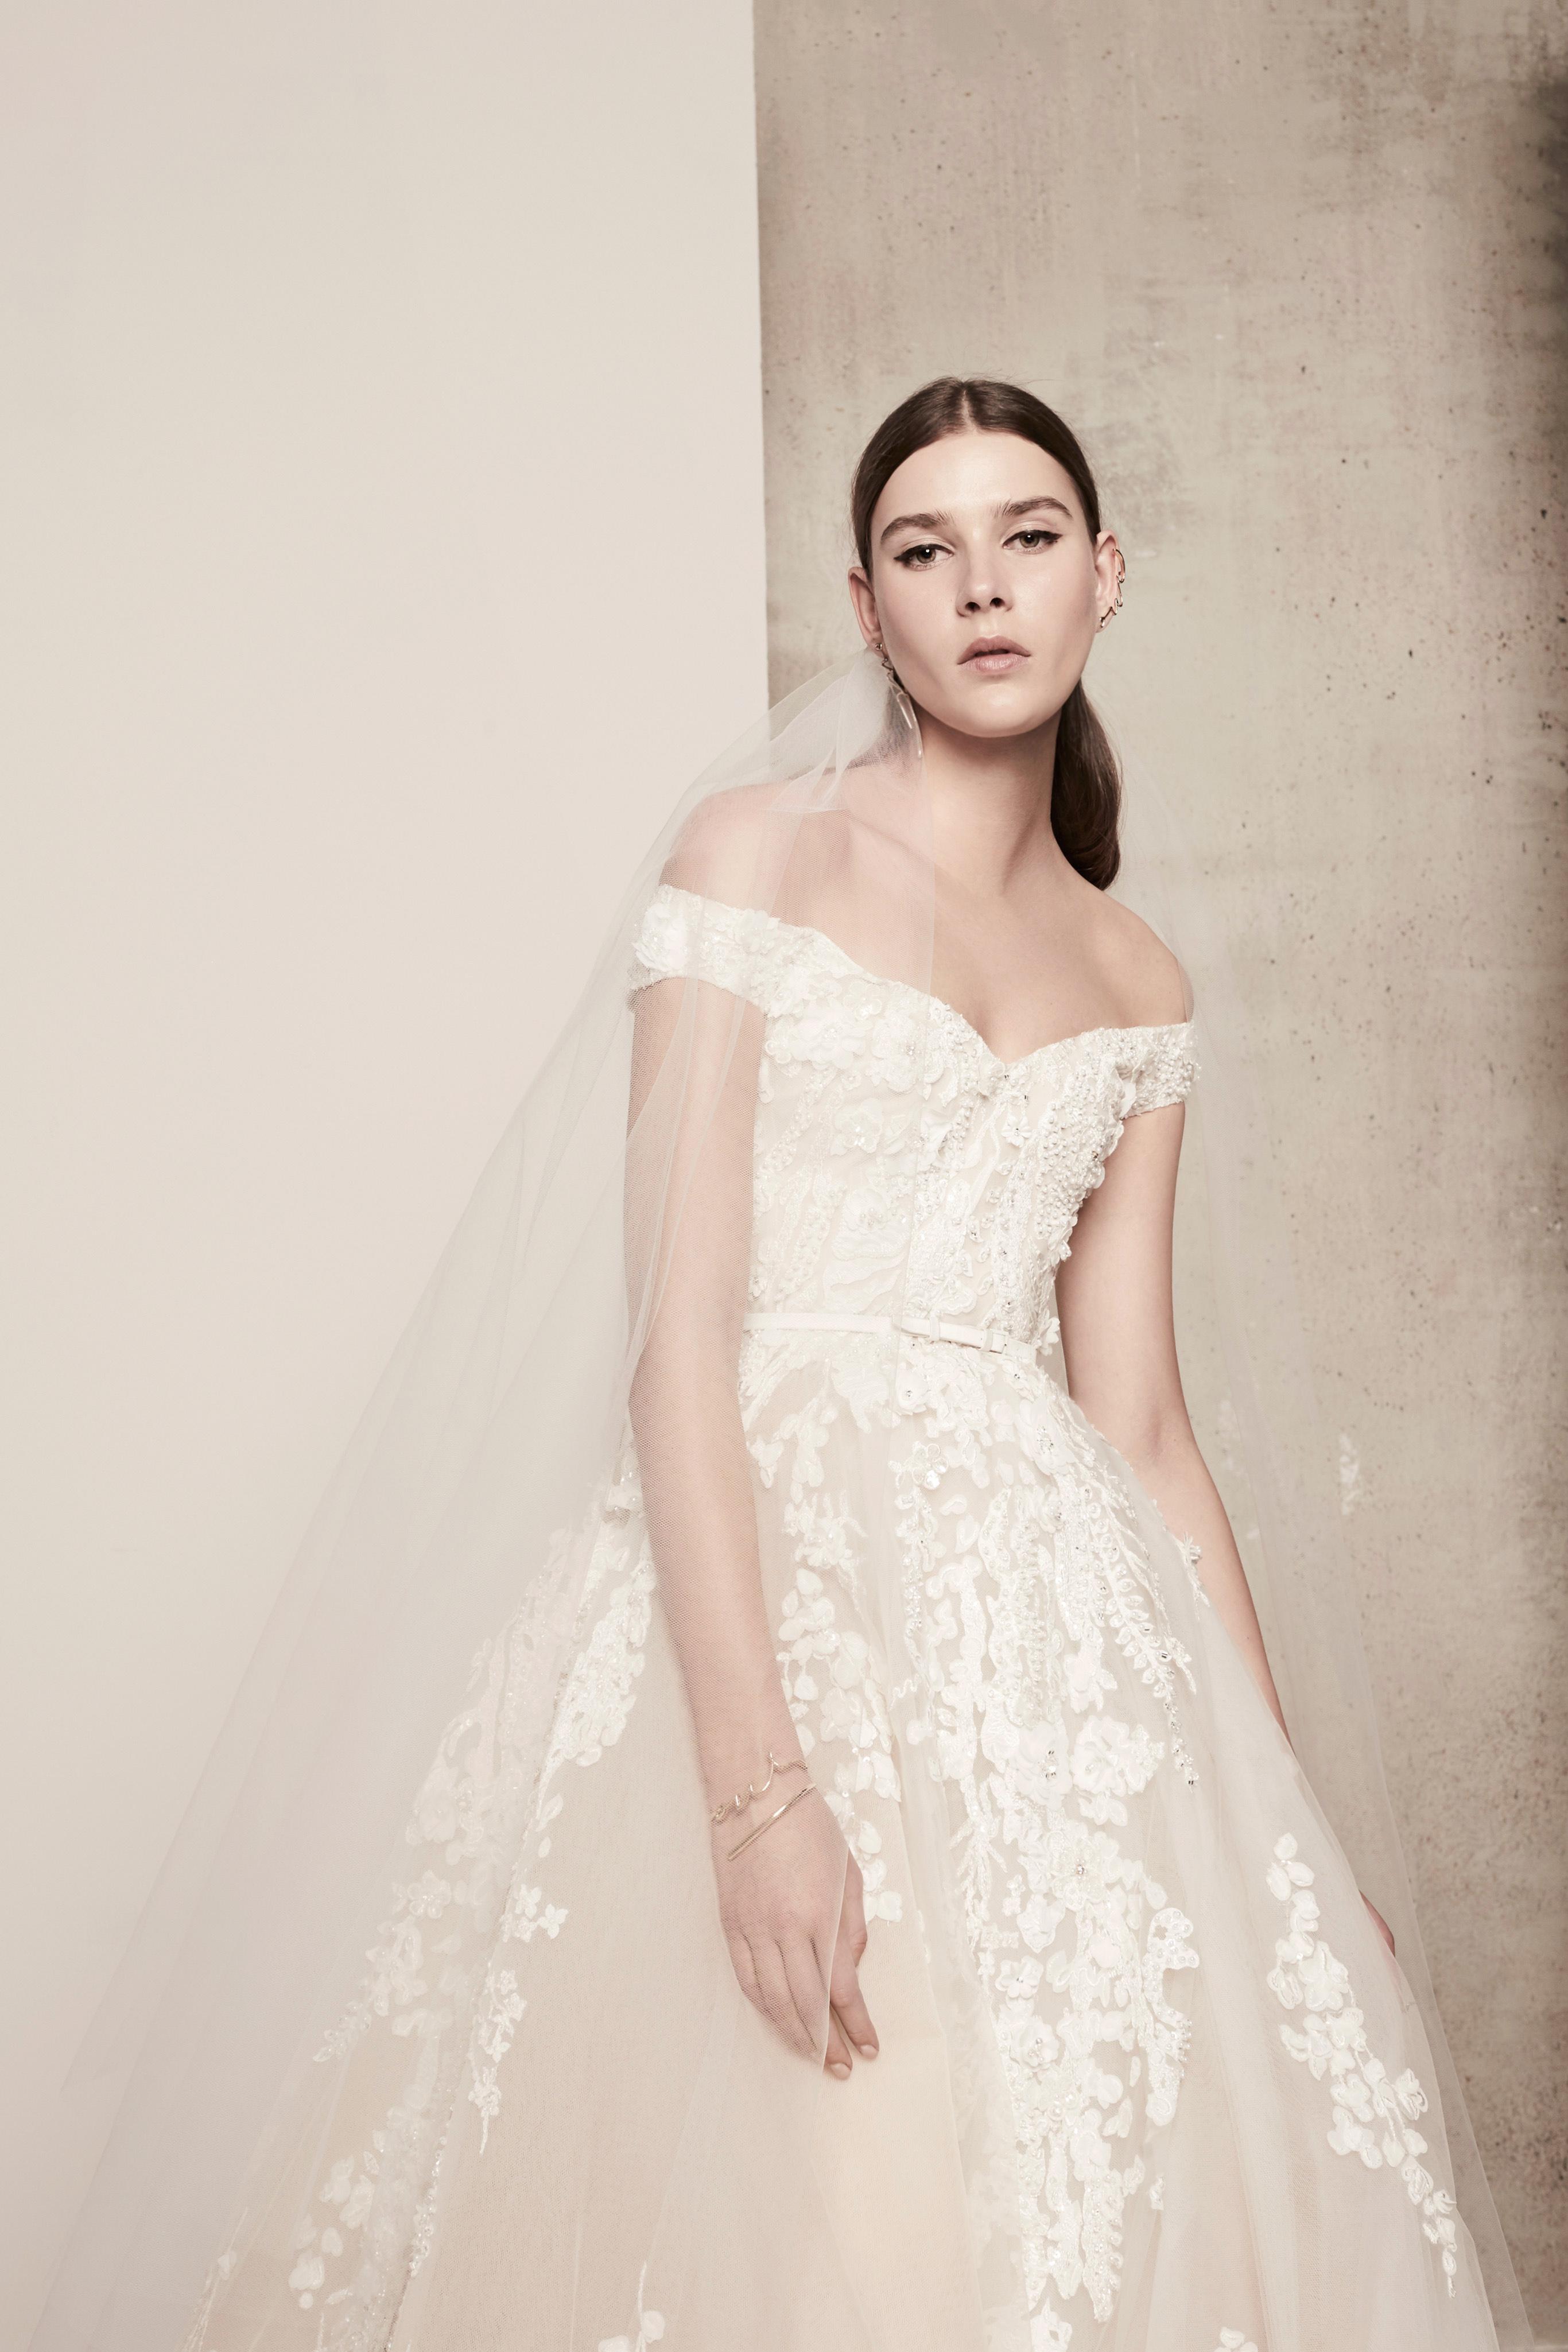 Elie Saab Wedding Dresses.Elie Saab Spring 2018 Wedding Dress Collection Martha Stewart Weddings